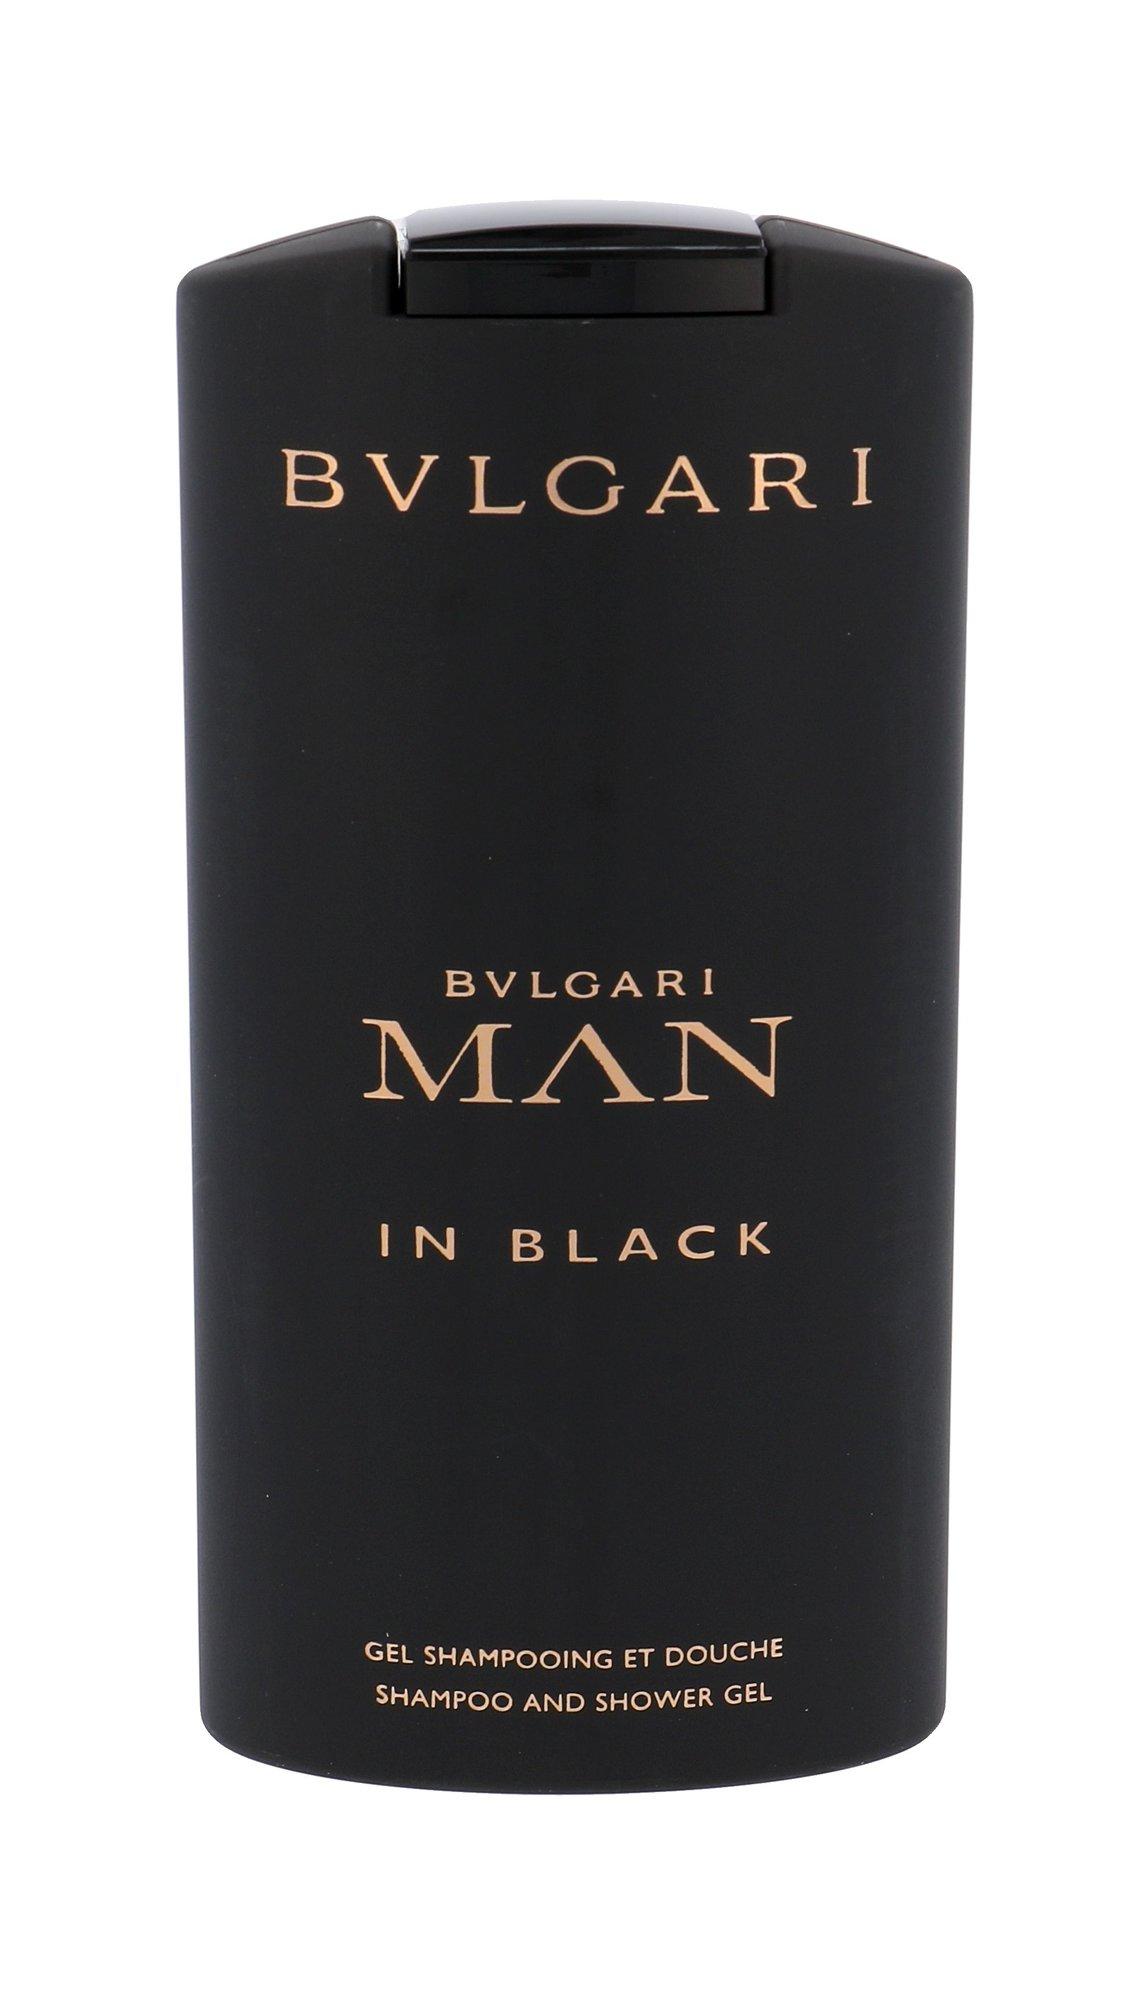 Bvlgari Man In Black Shower gel 200ml